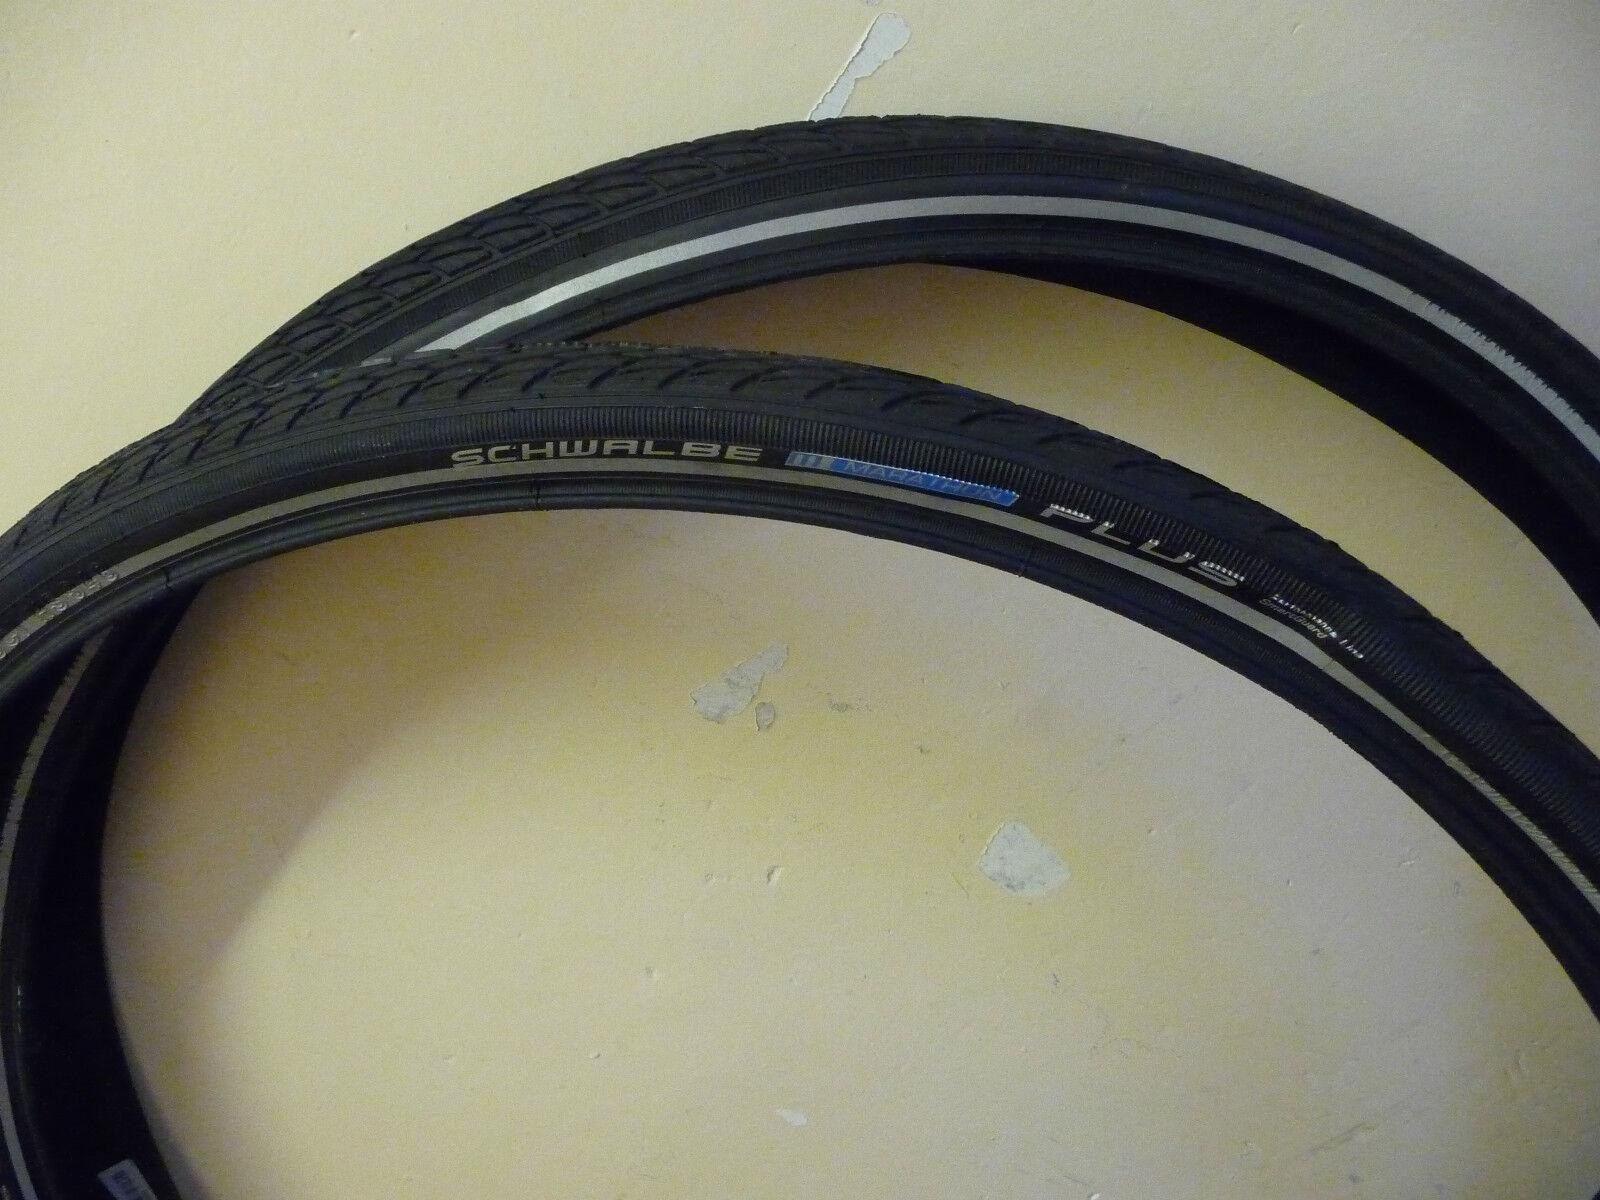 Schwalbe Marathon PLUS Cycle Bike Tyres 700 x 38c PAIR NEW Puncture Predection